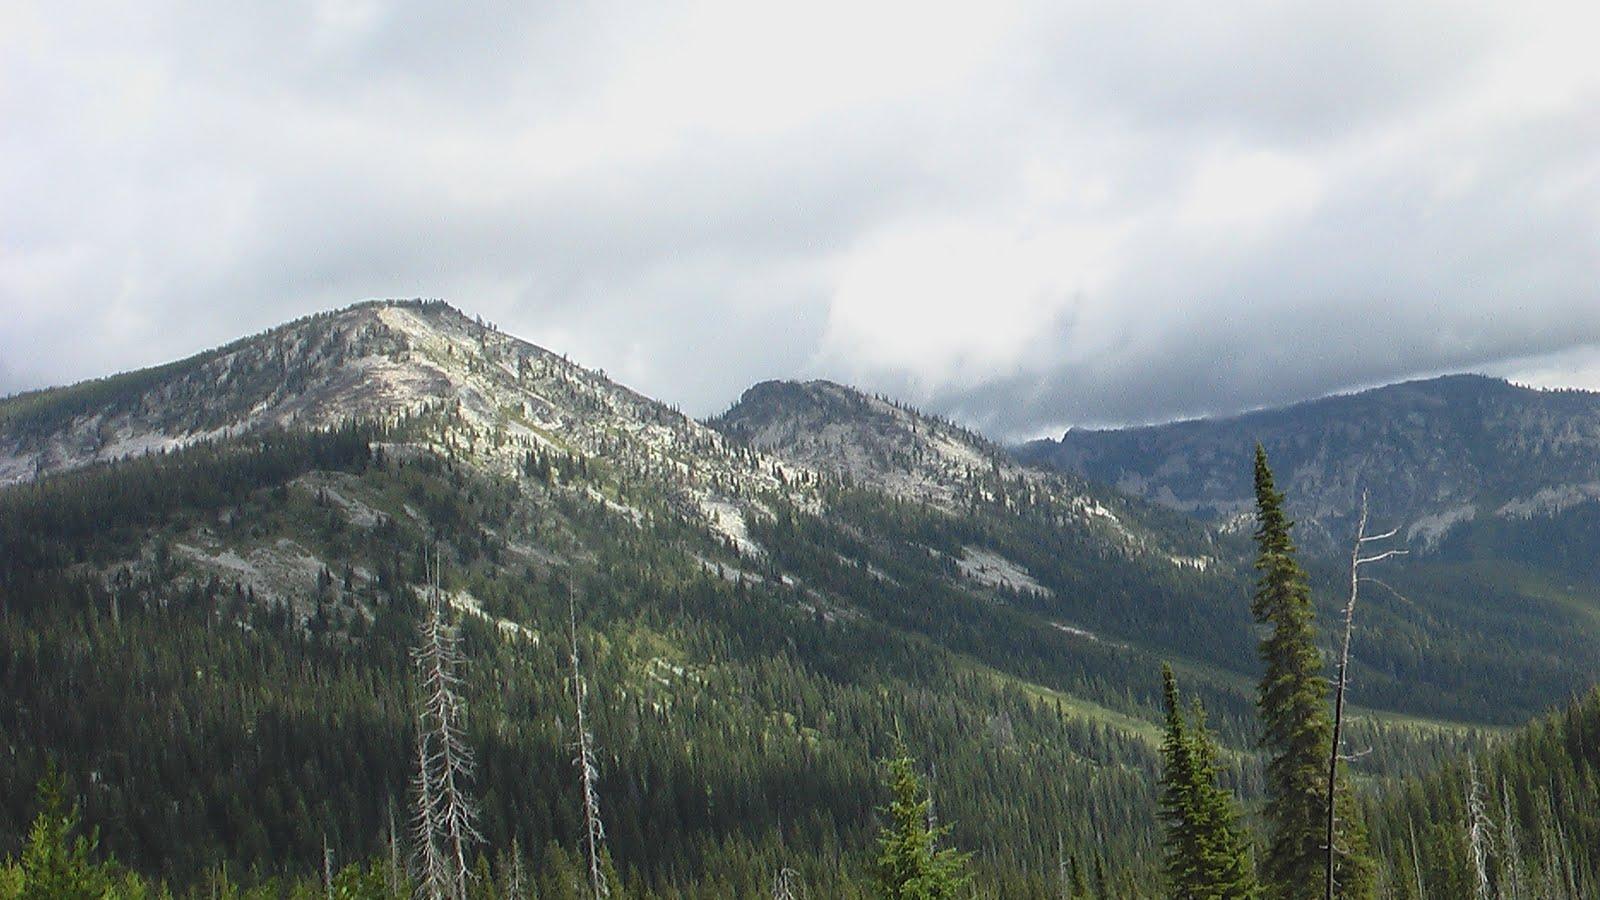 Slogging Toward Liberty: Montana Legislative Session in Helena, MT